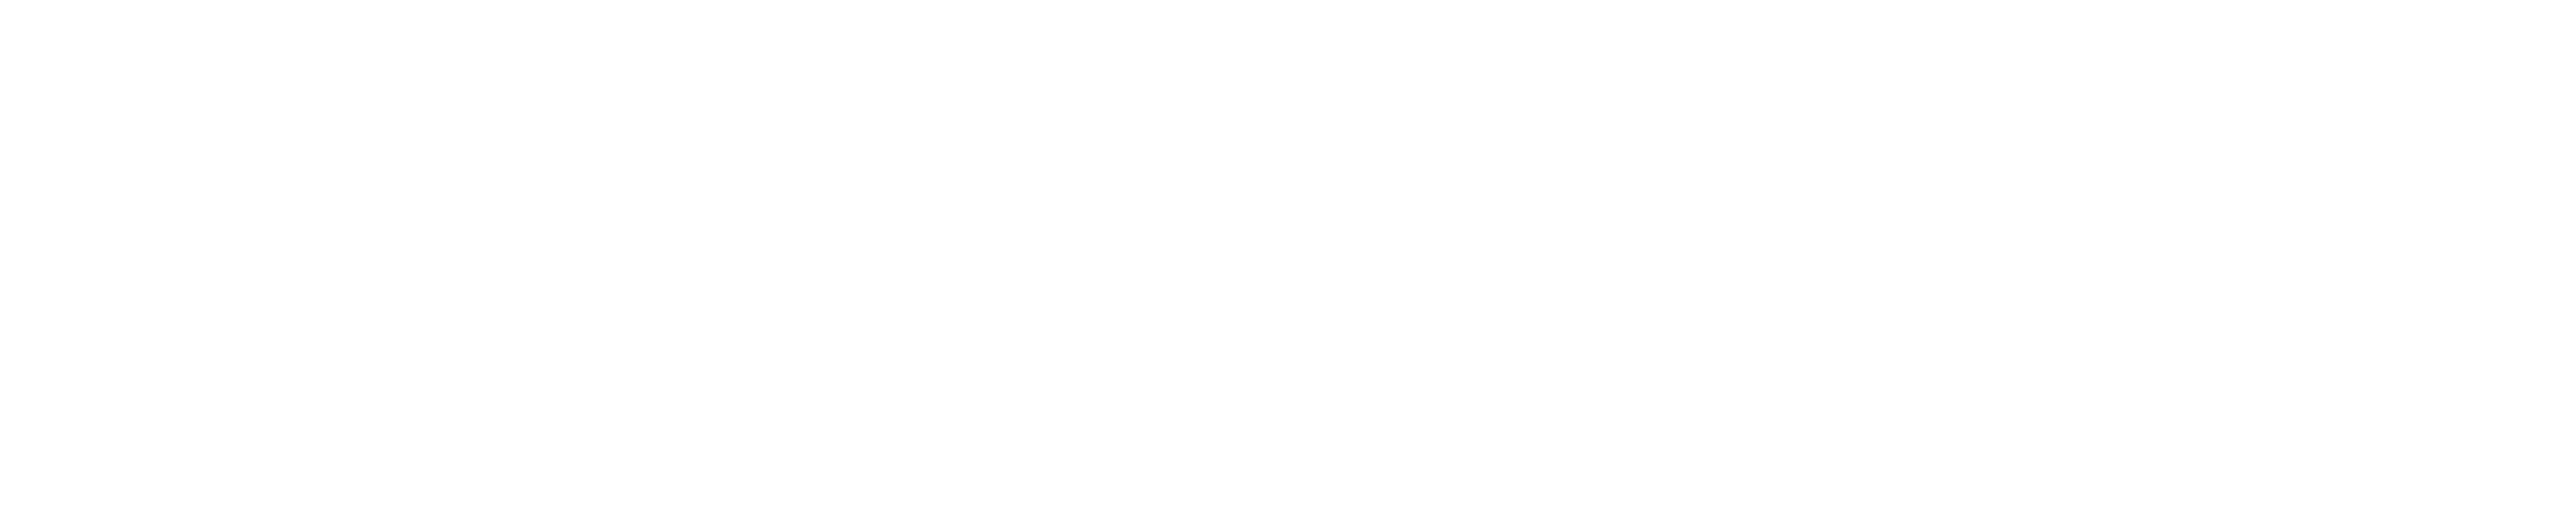 Our Medicines